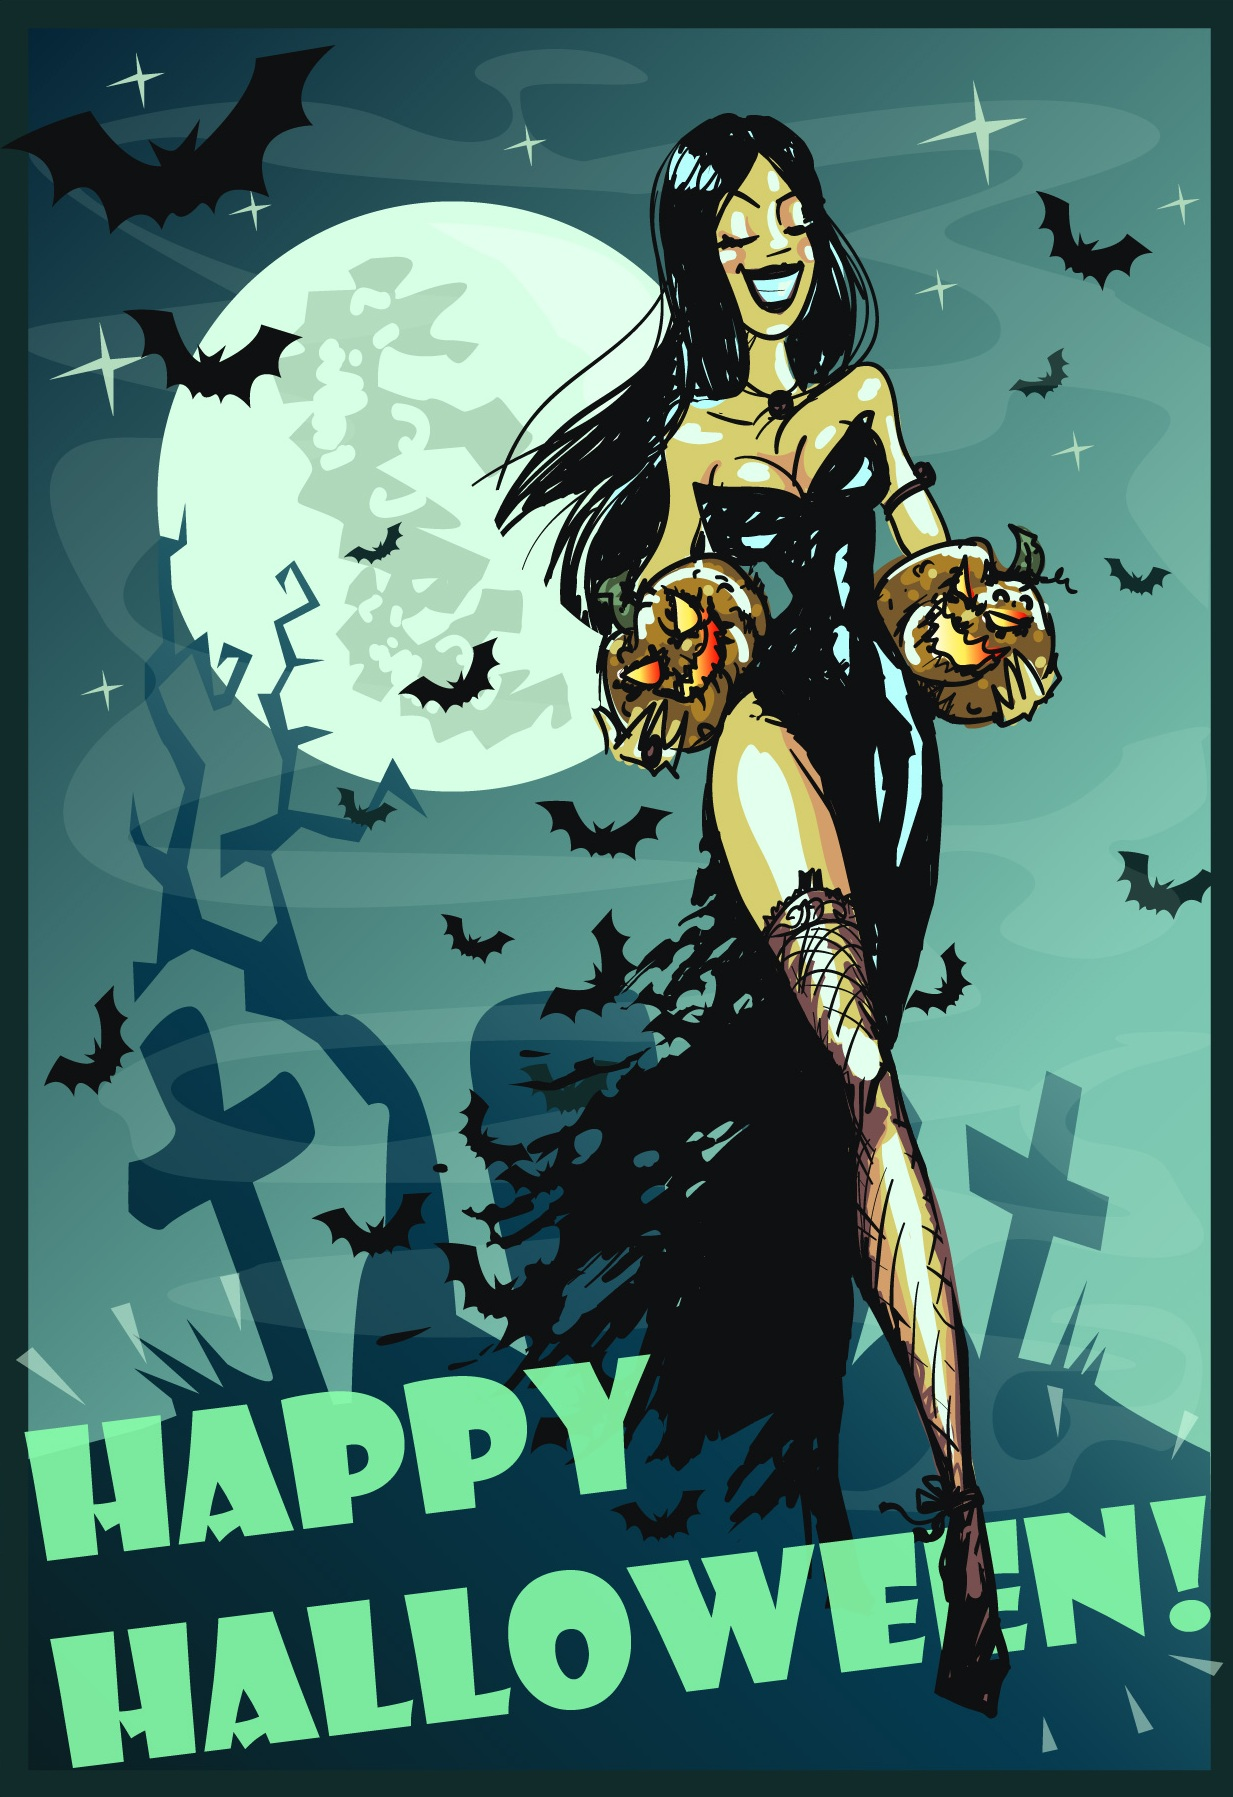 HalloweenGirl_CARD_17-1_NH.jpg